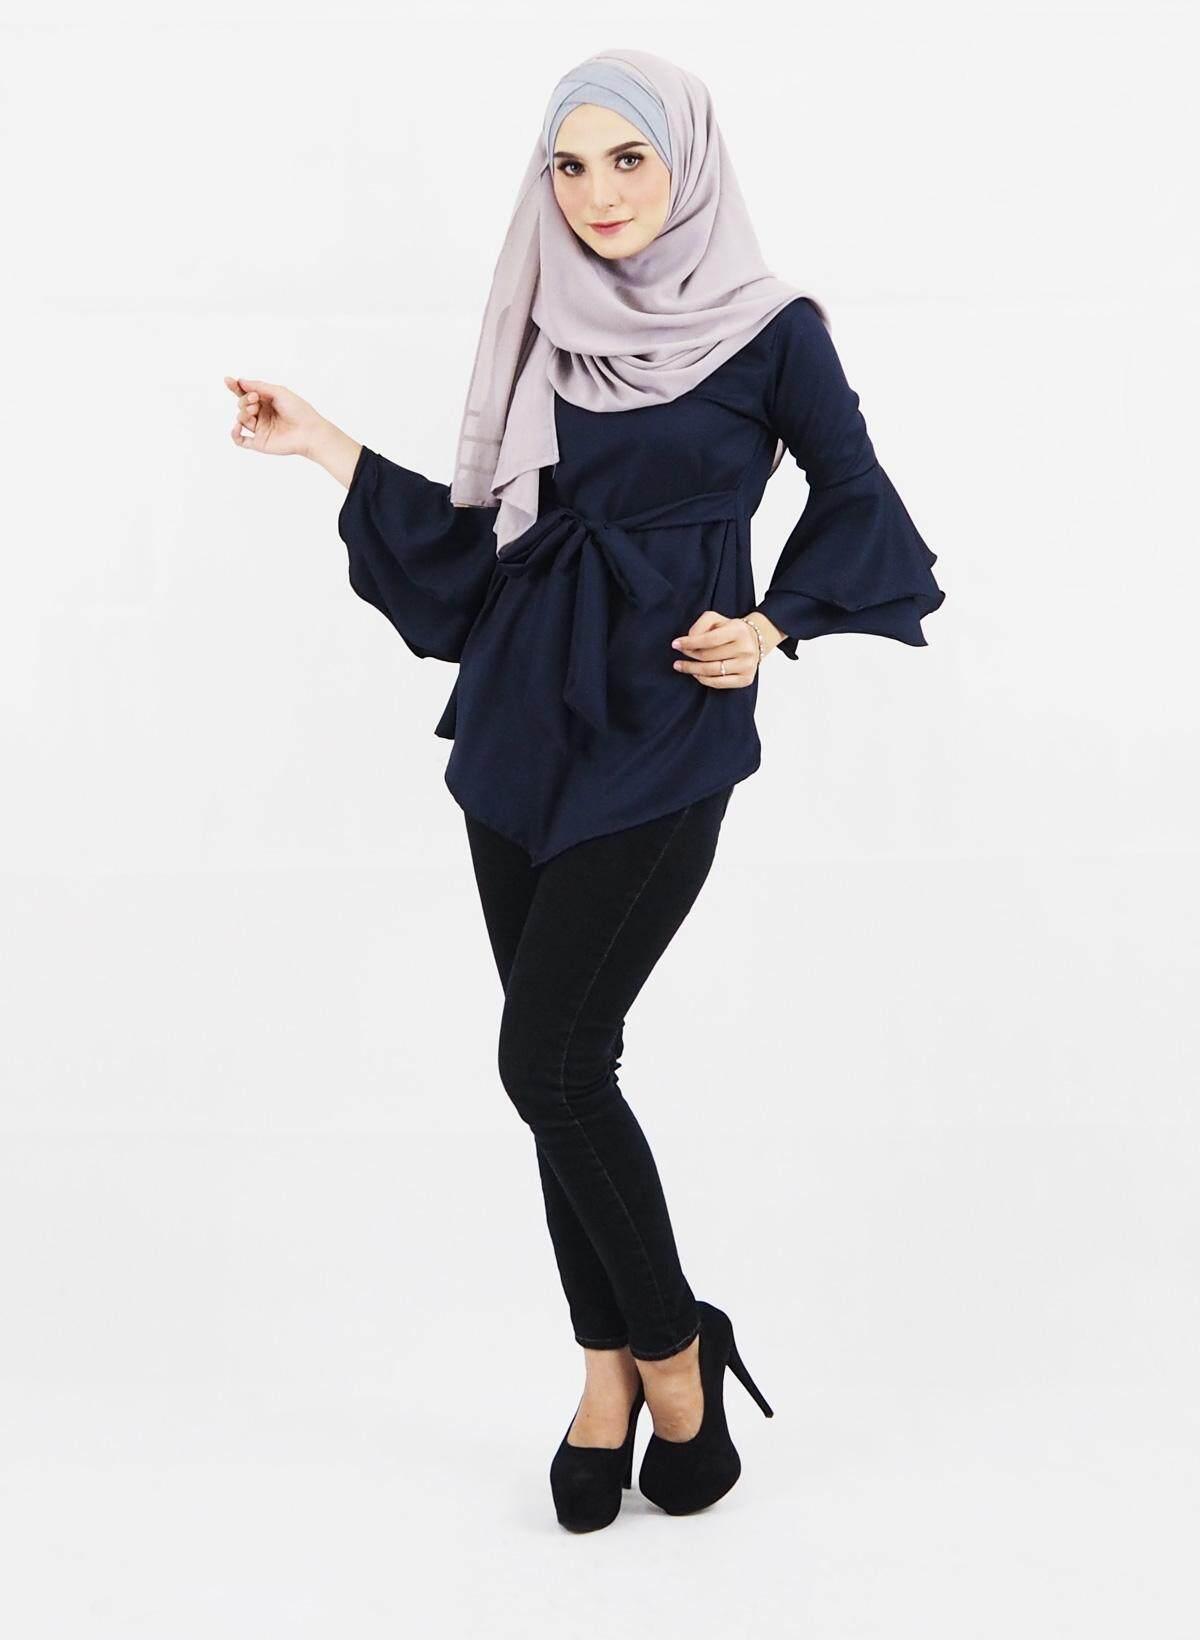 Muslim Women Fashion Blouse / Muslimah Modern Ribbon Blouse / Rola Ribbon Blouse (S-XL)